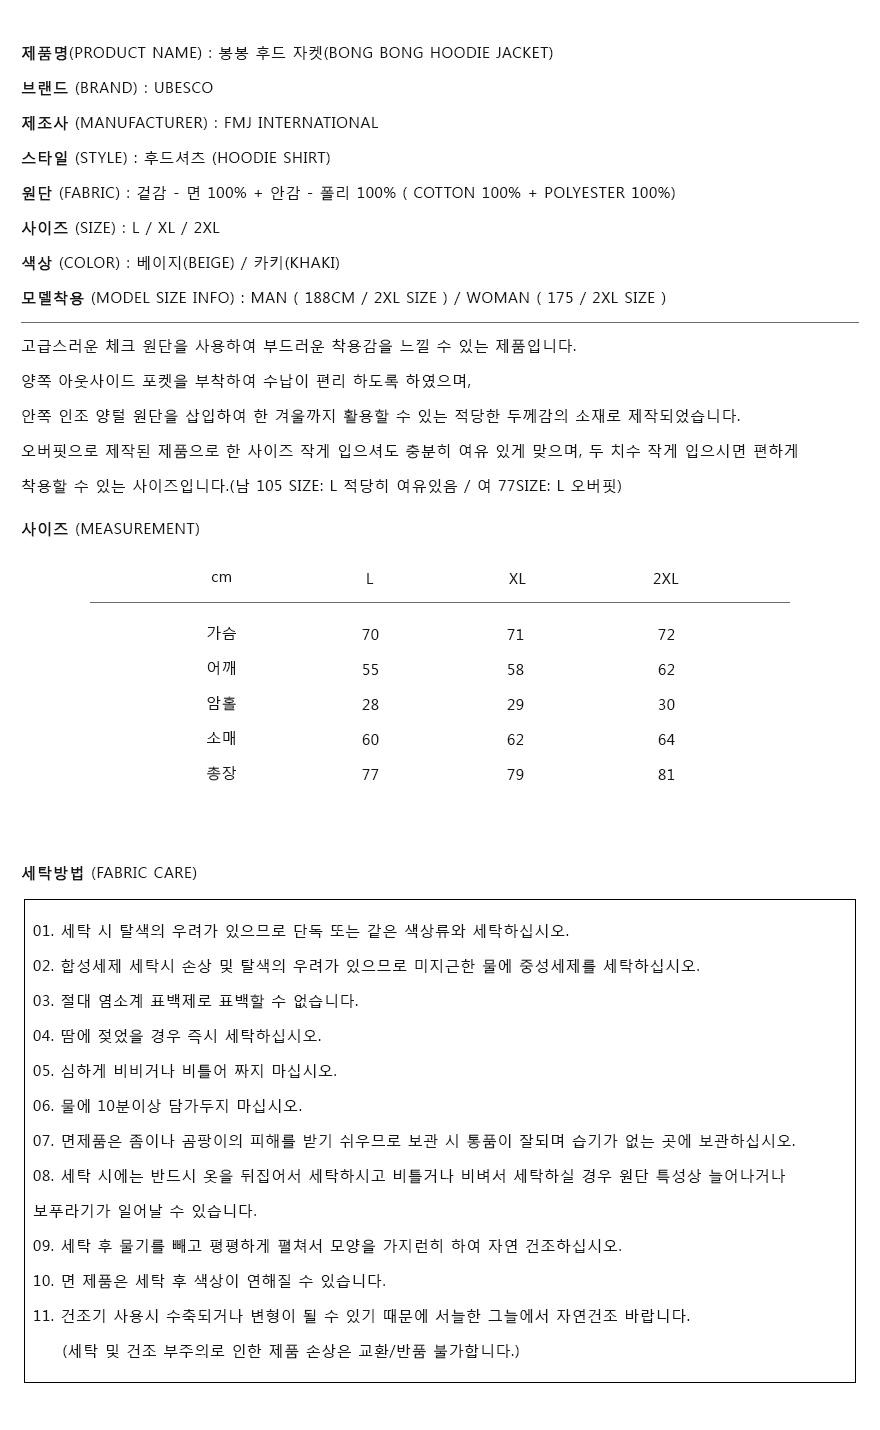 20180911_uc_bongbong_info_ms.jpg